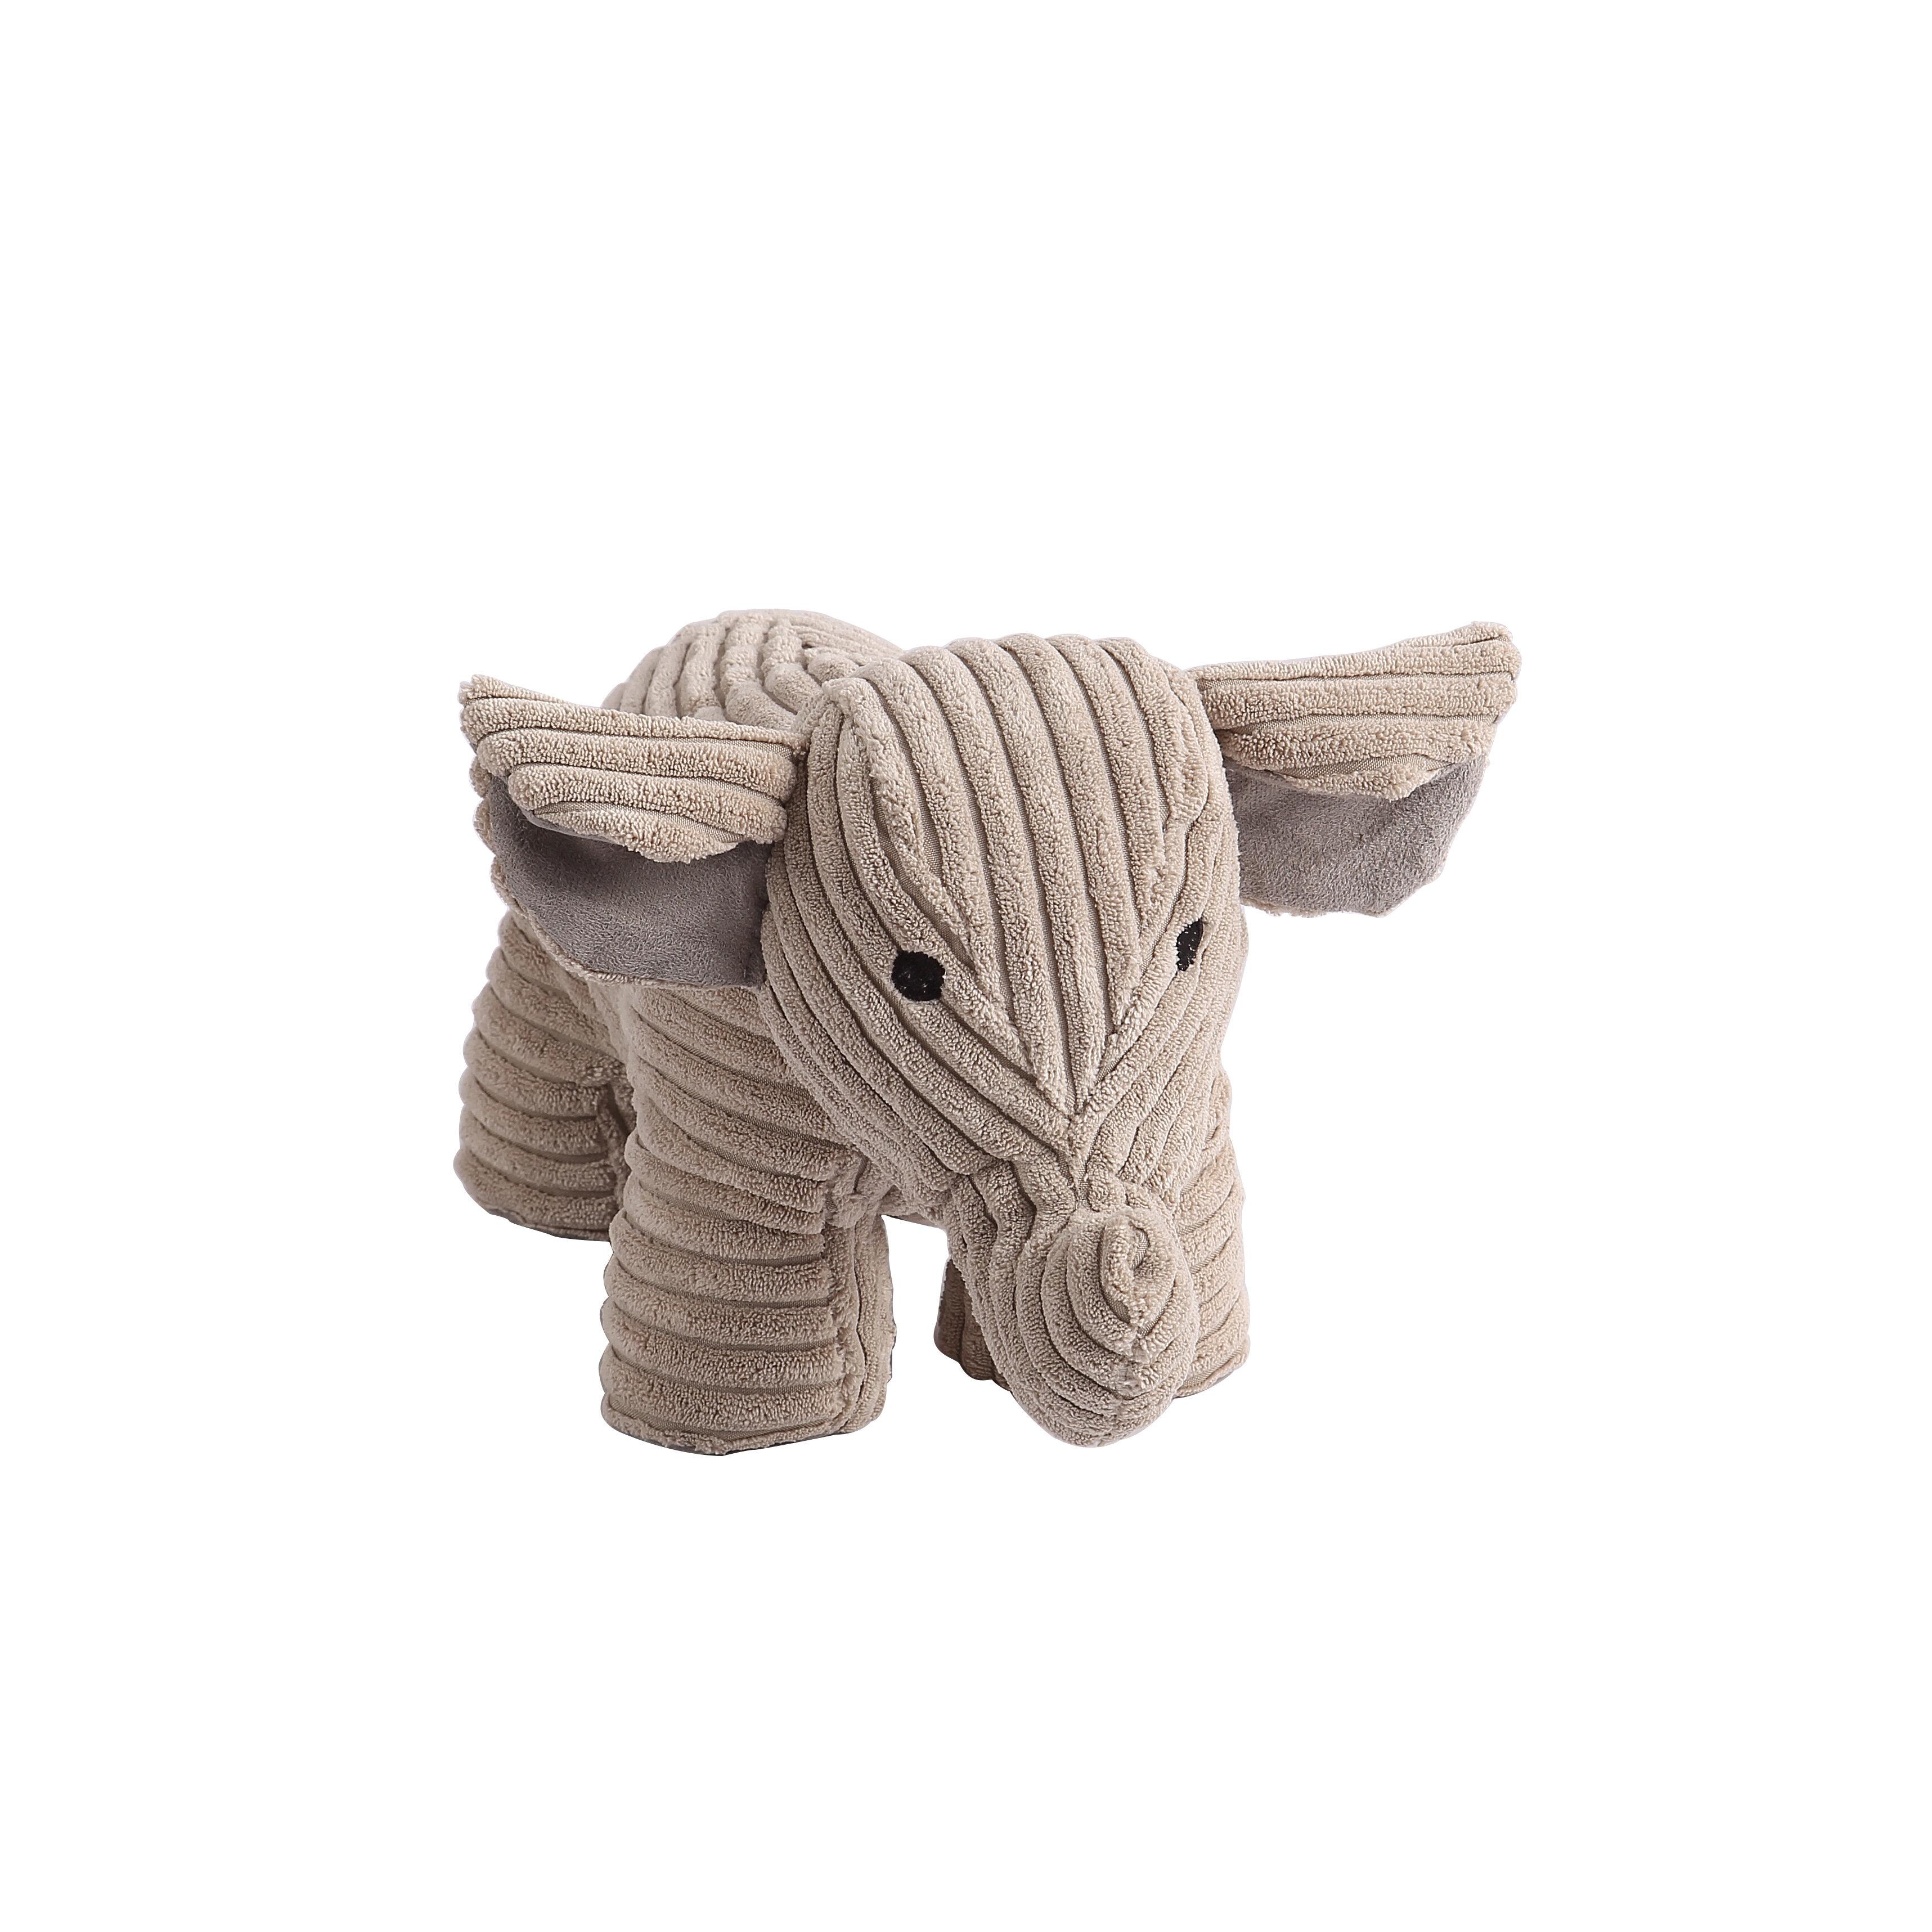 Morgan Home Emily Elephant Fabric Weighted Floor Stop Reviews Wayfair